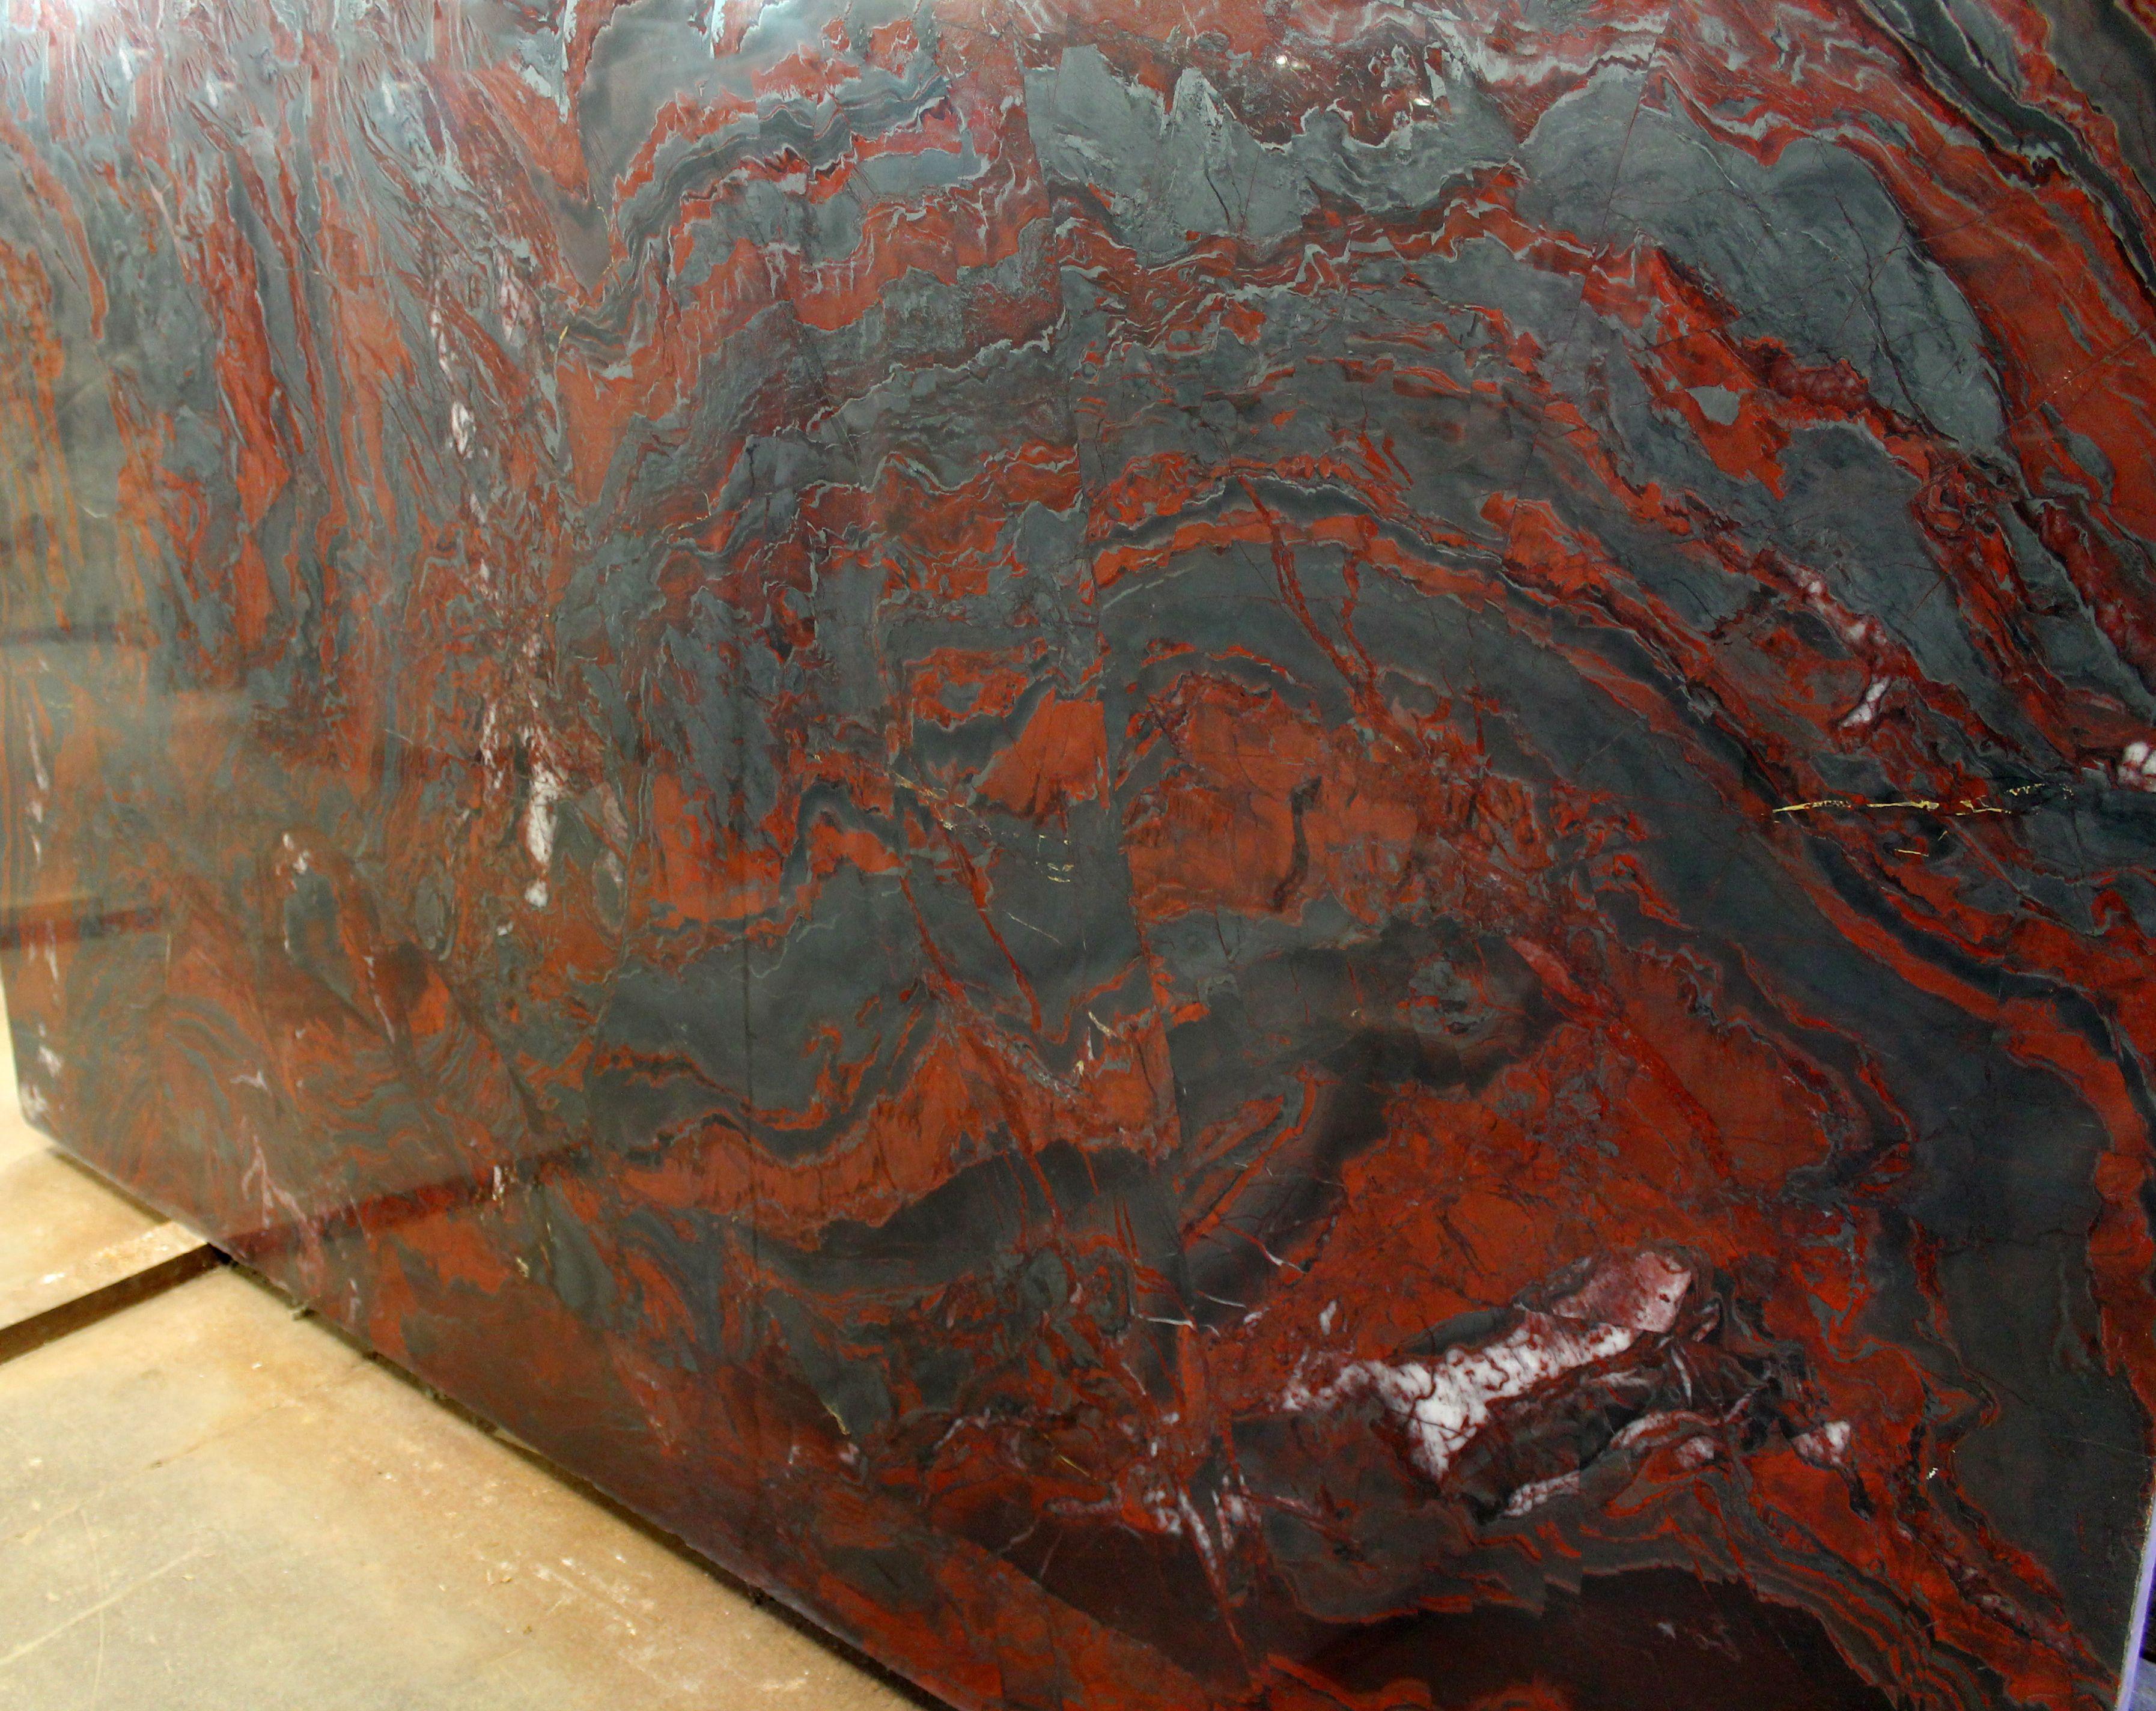 Iron Red Granite Homedecor Countertops Kitchen Bathroom Granite Marble Red Granite Countertops Outdoor Kitchen Countertops Marble Countertops Kitchen